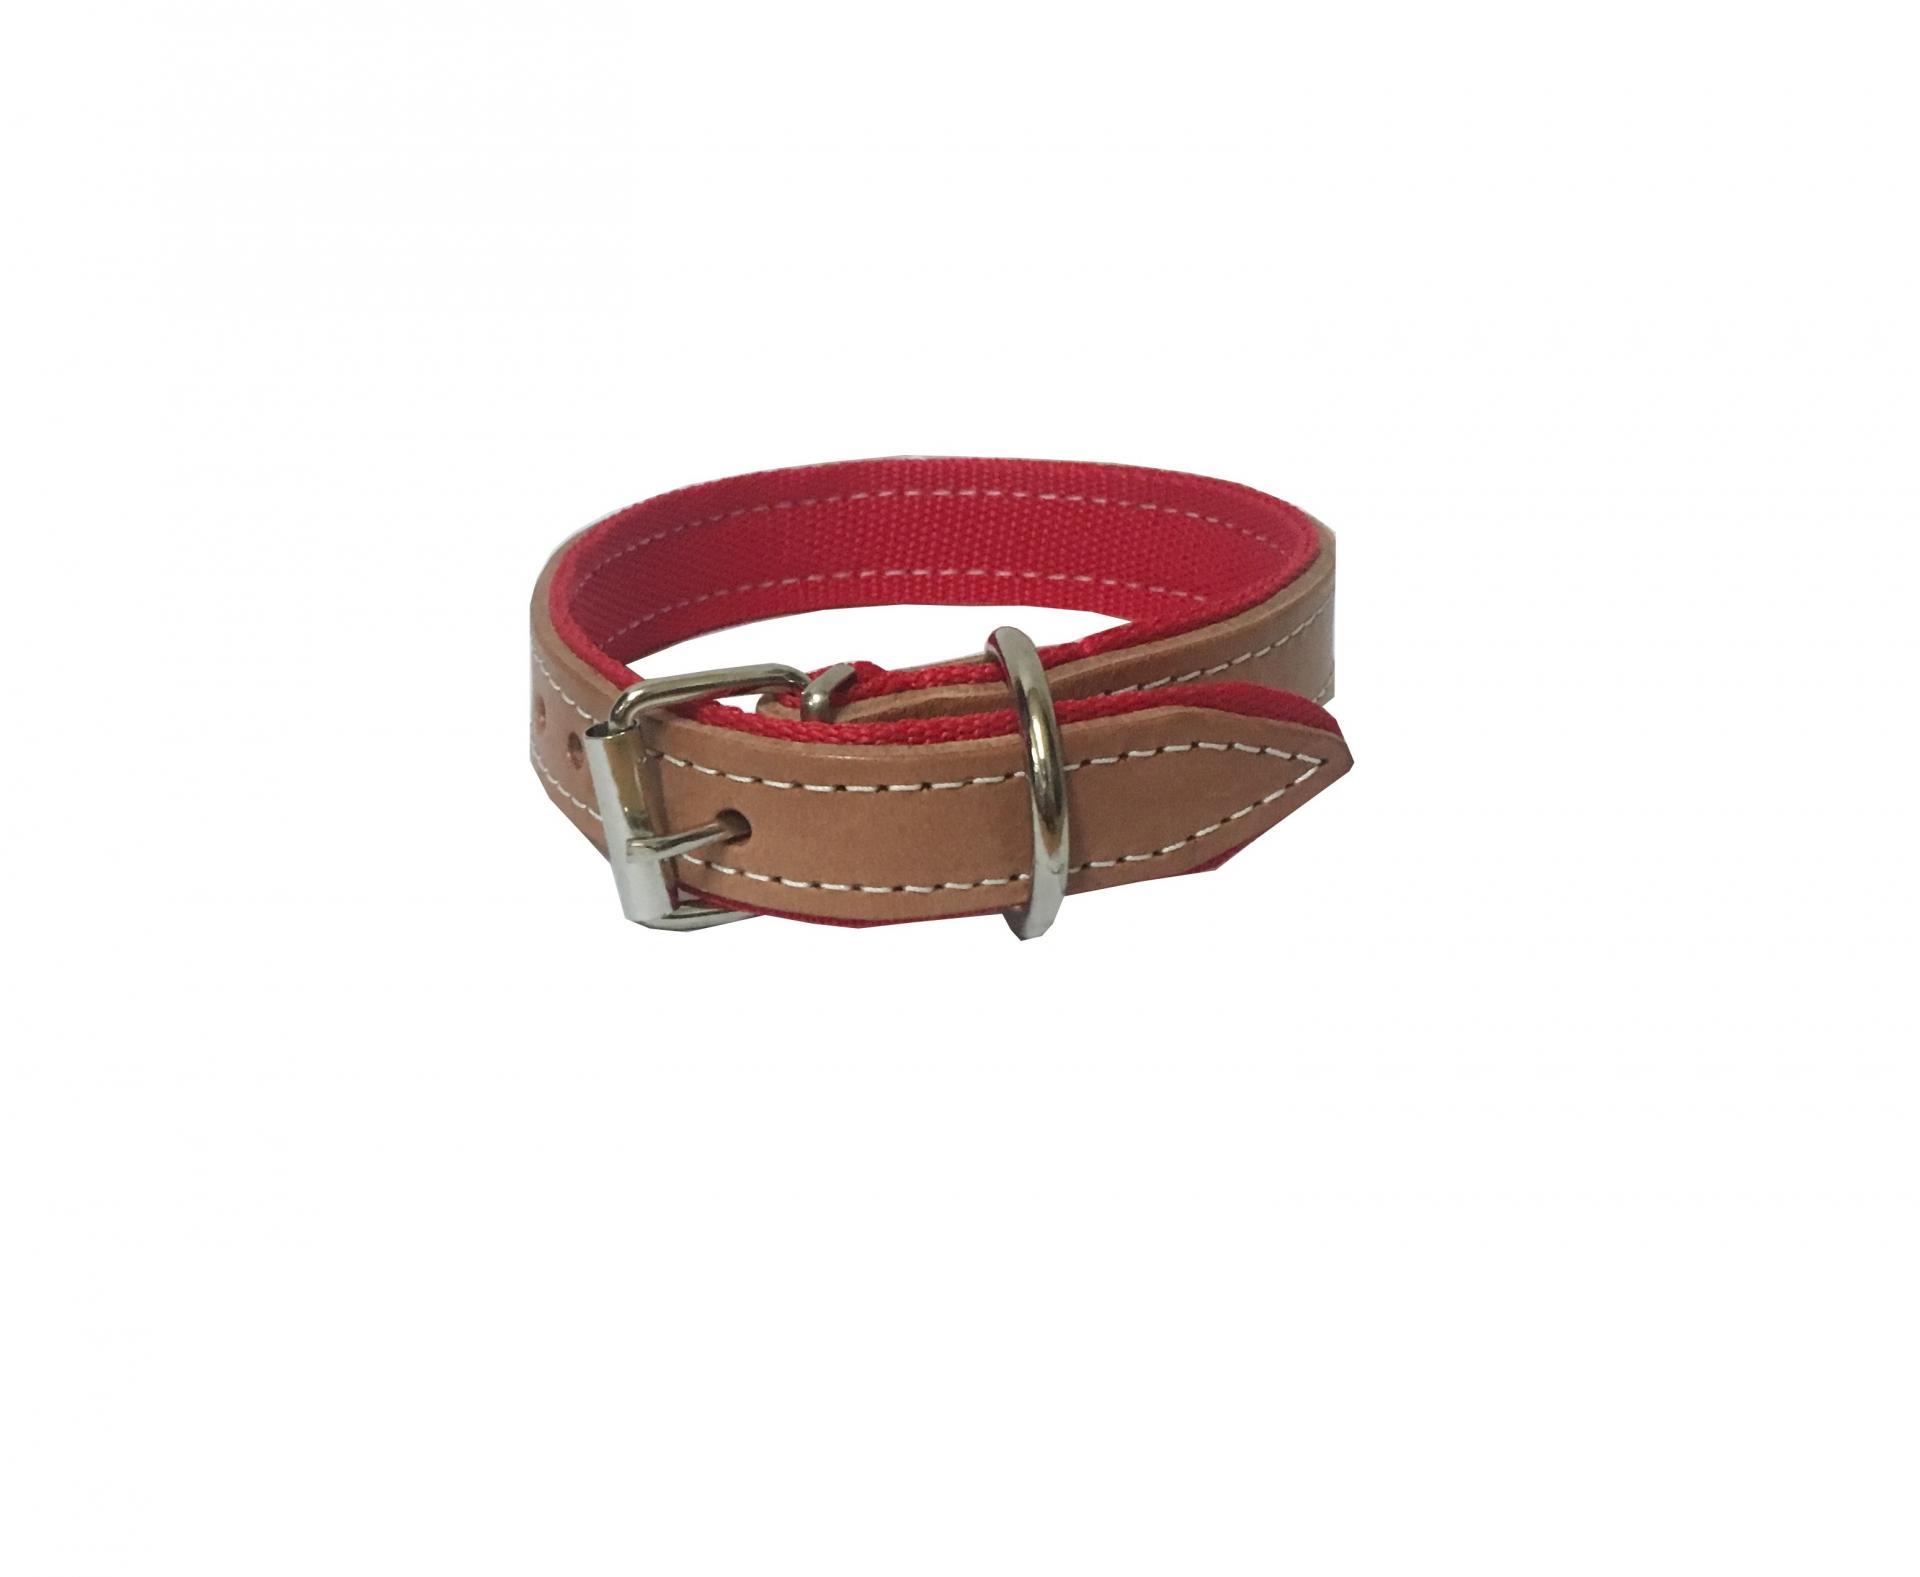 Collar perro cuero y nylon 60 cm x 3 cm